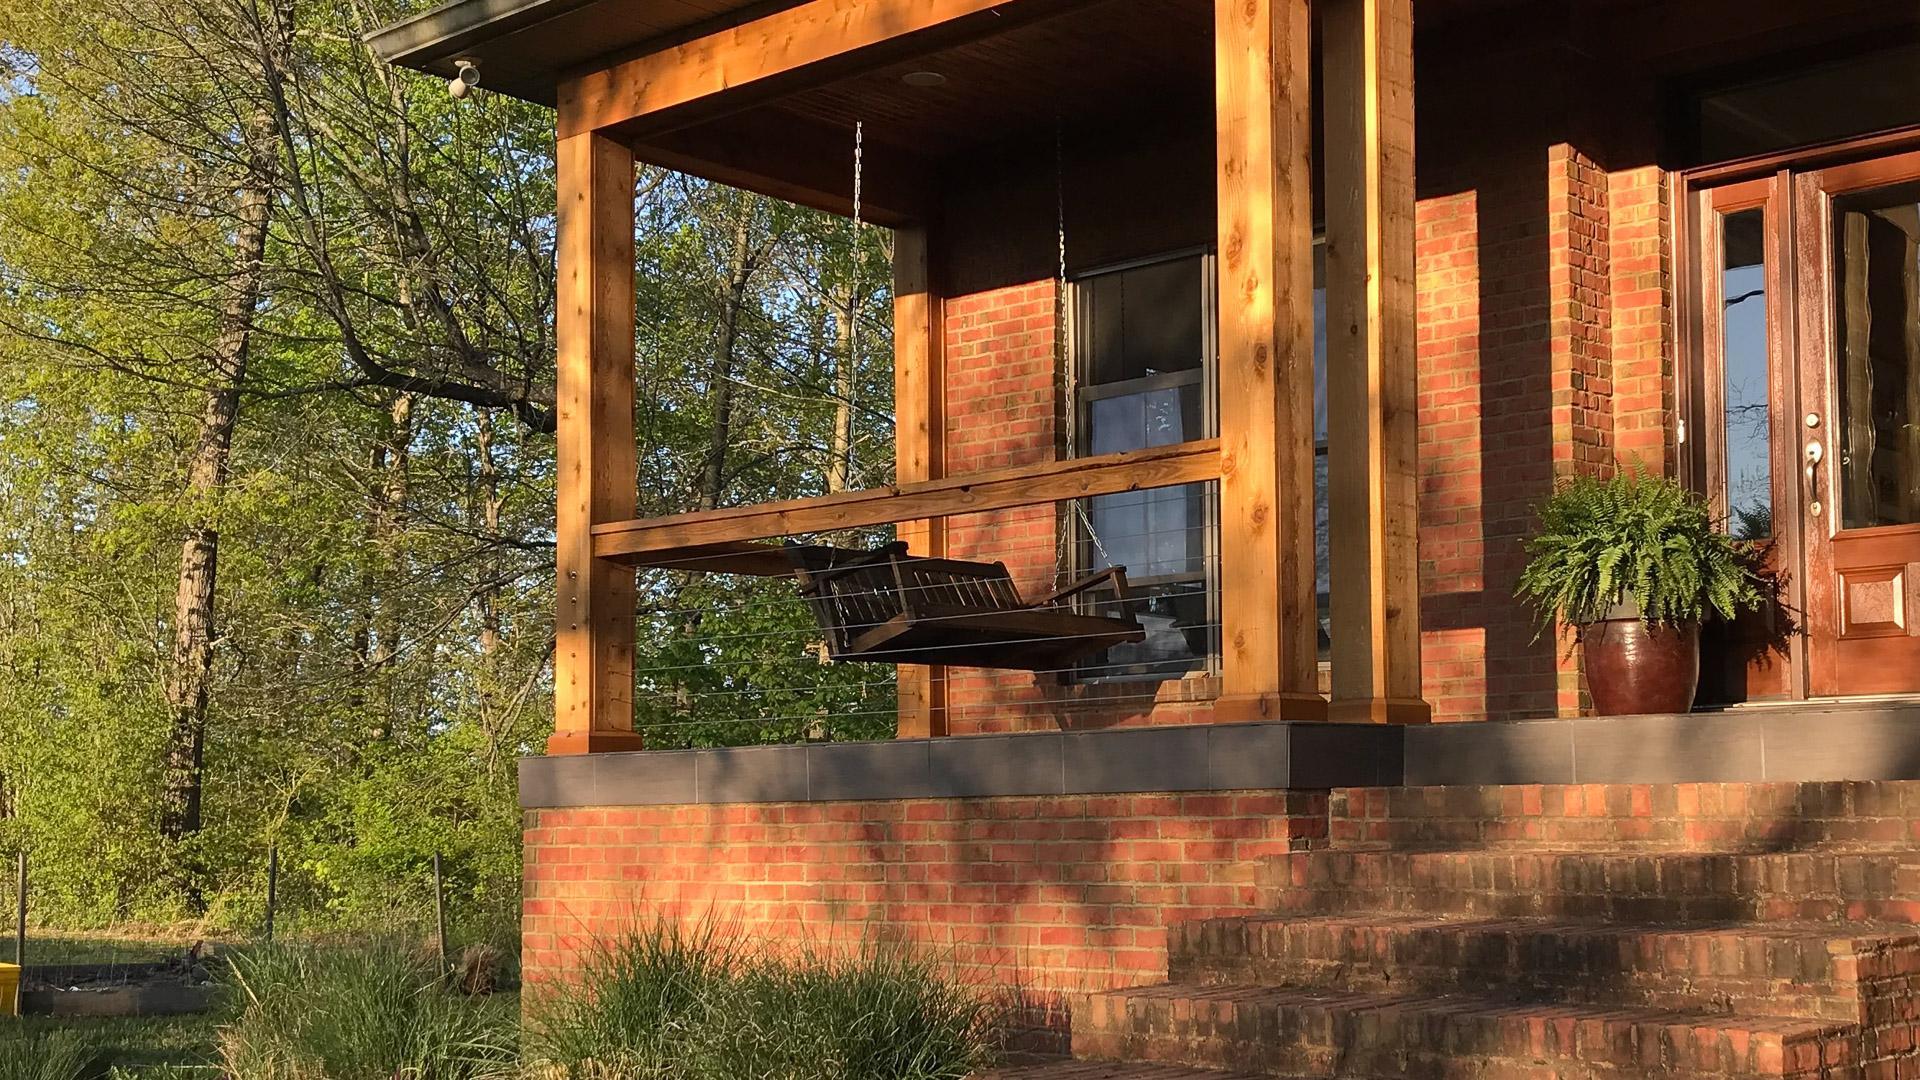 Cameron Huddleston house in Bowling Green Kentucky